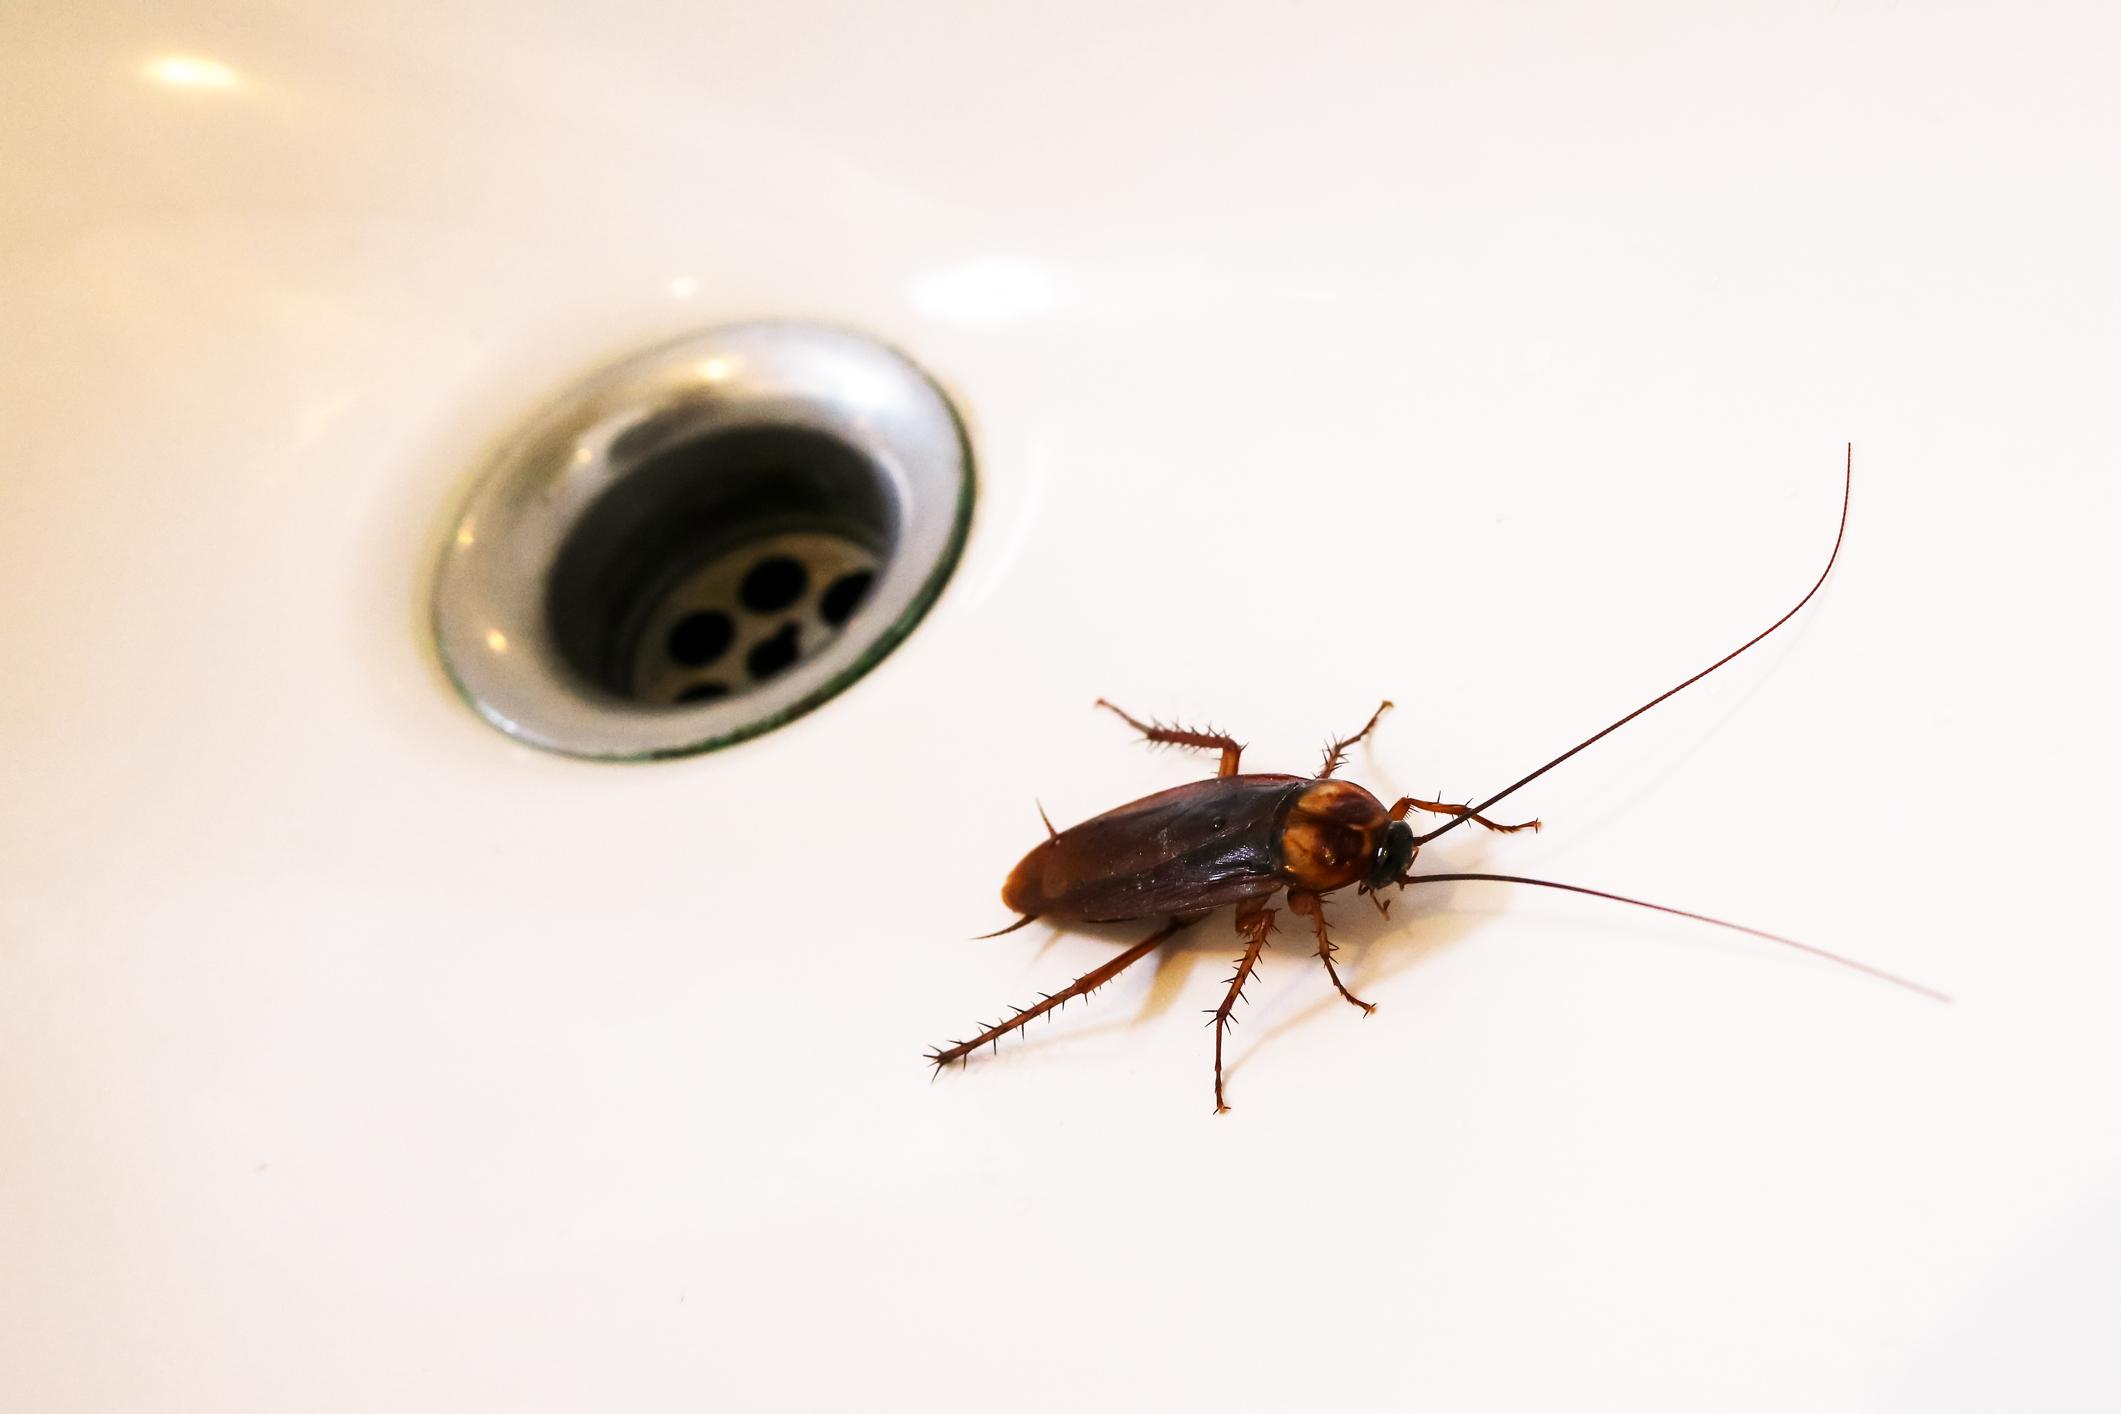 Cockroach bysink drain